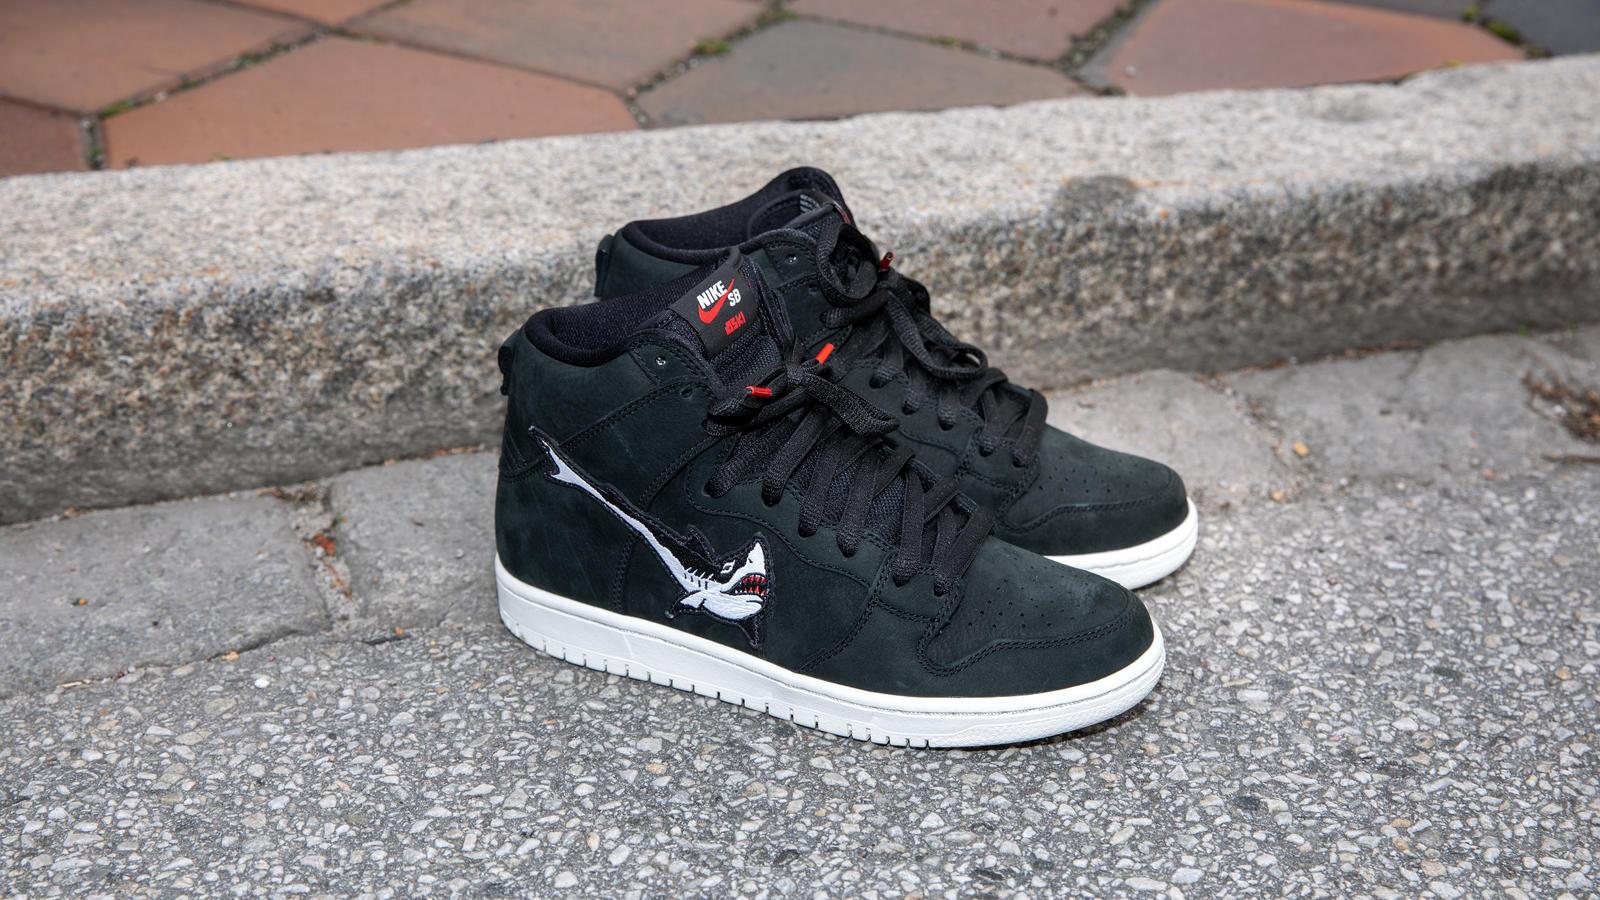 Red Air Max 90, Jordans For Women, Nike Sb High Top Dunks  